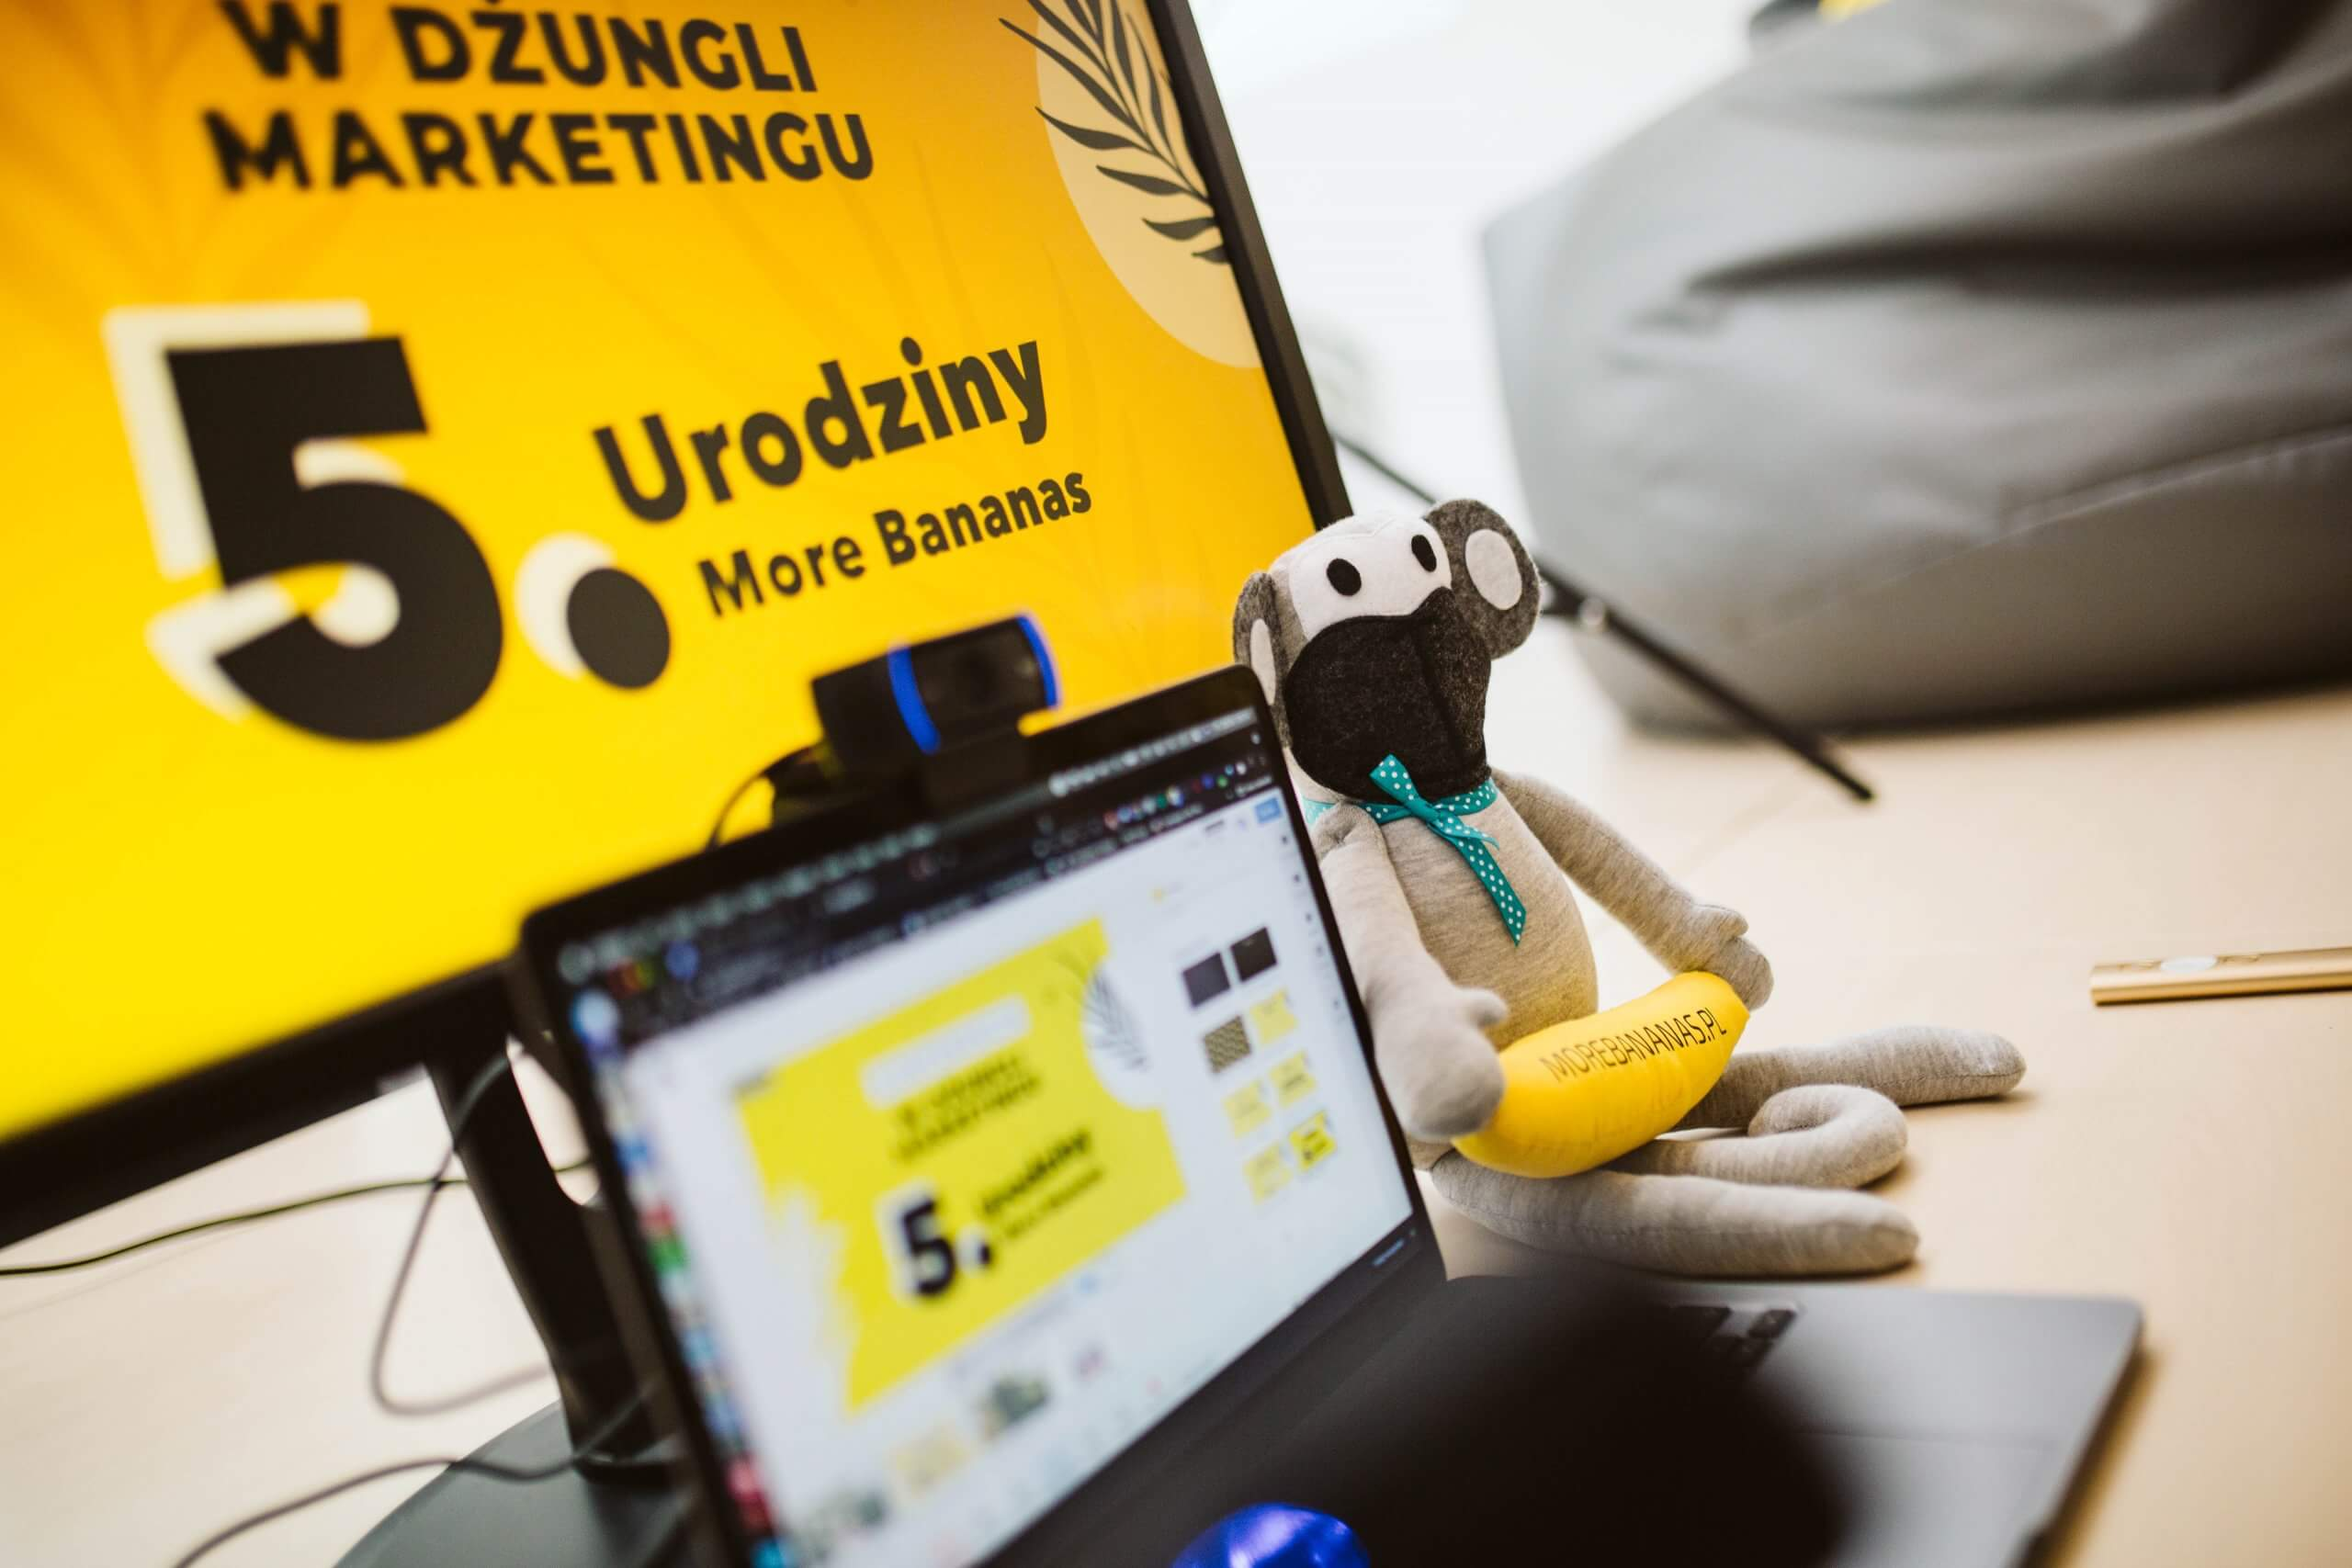 urodziny more bananas konferencja